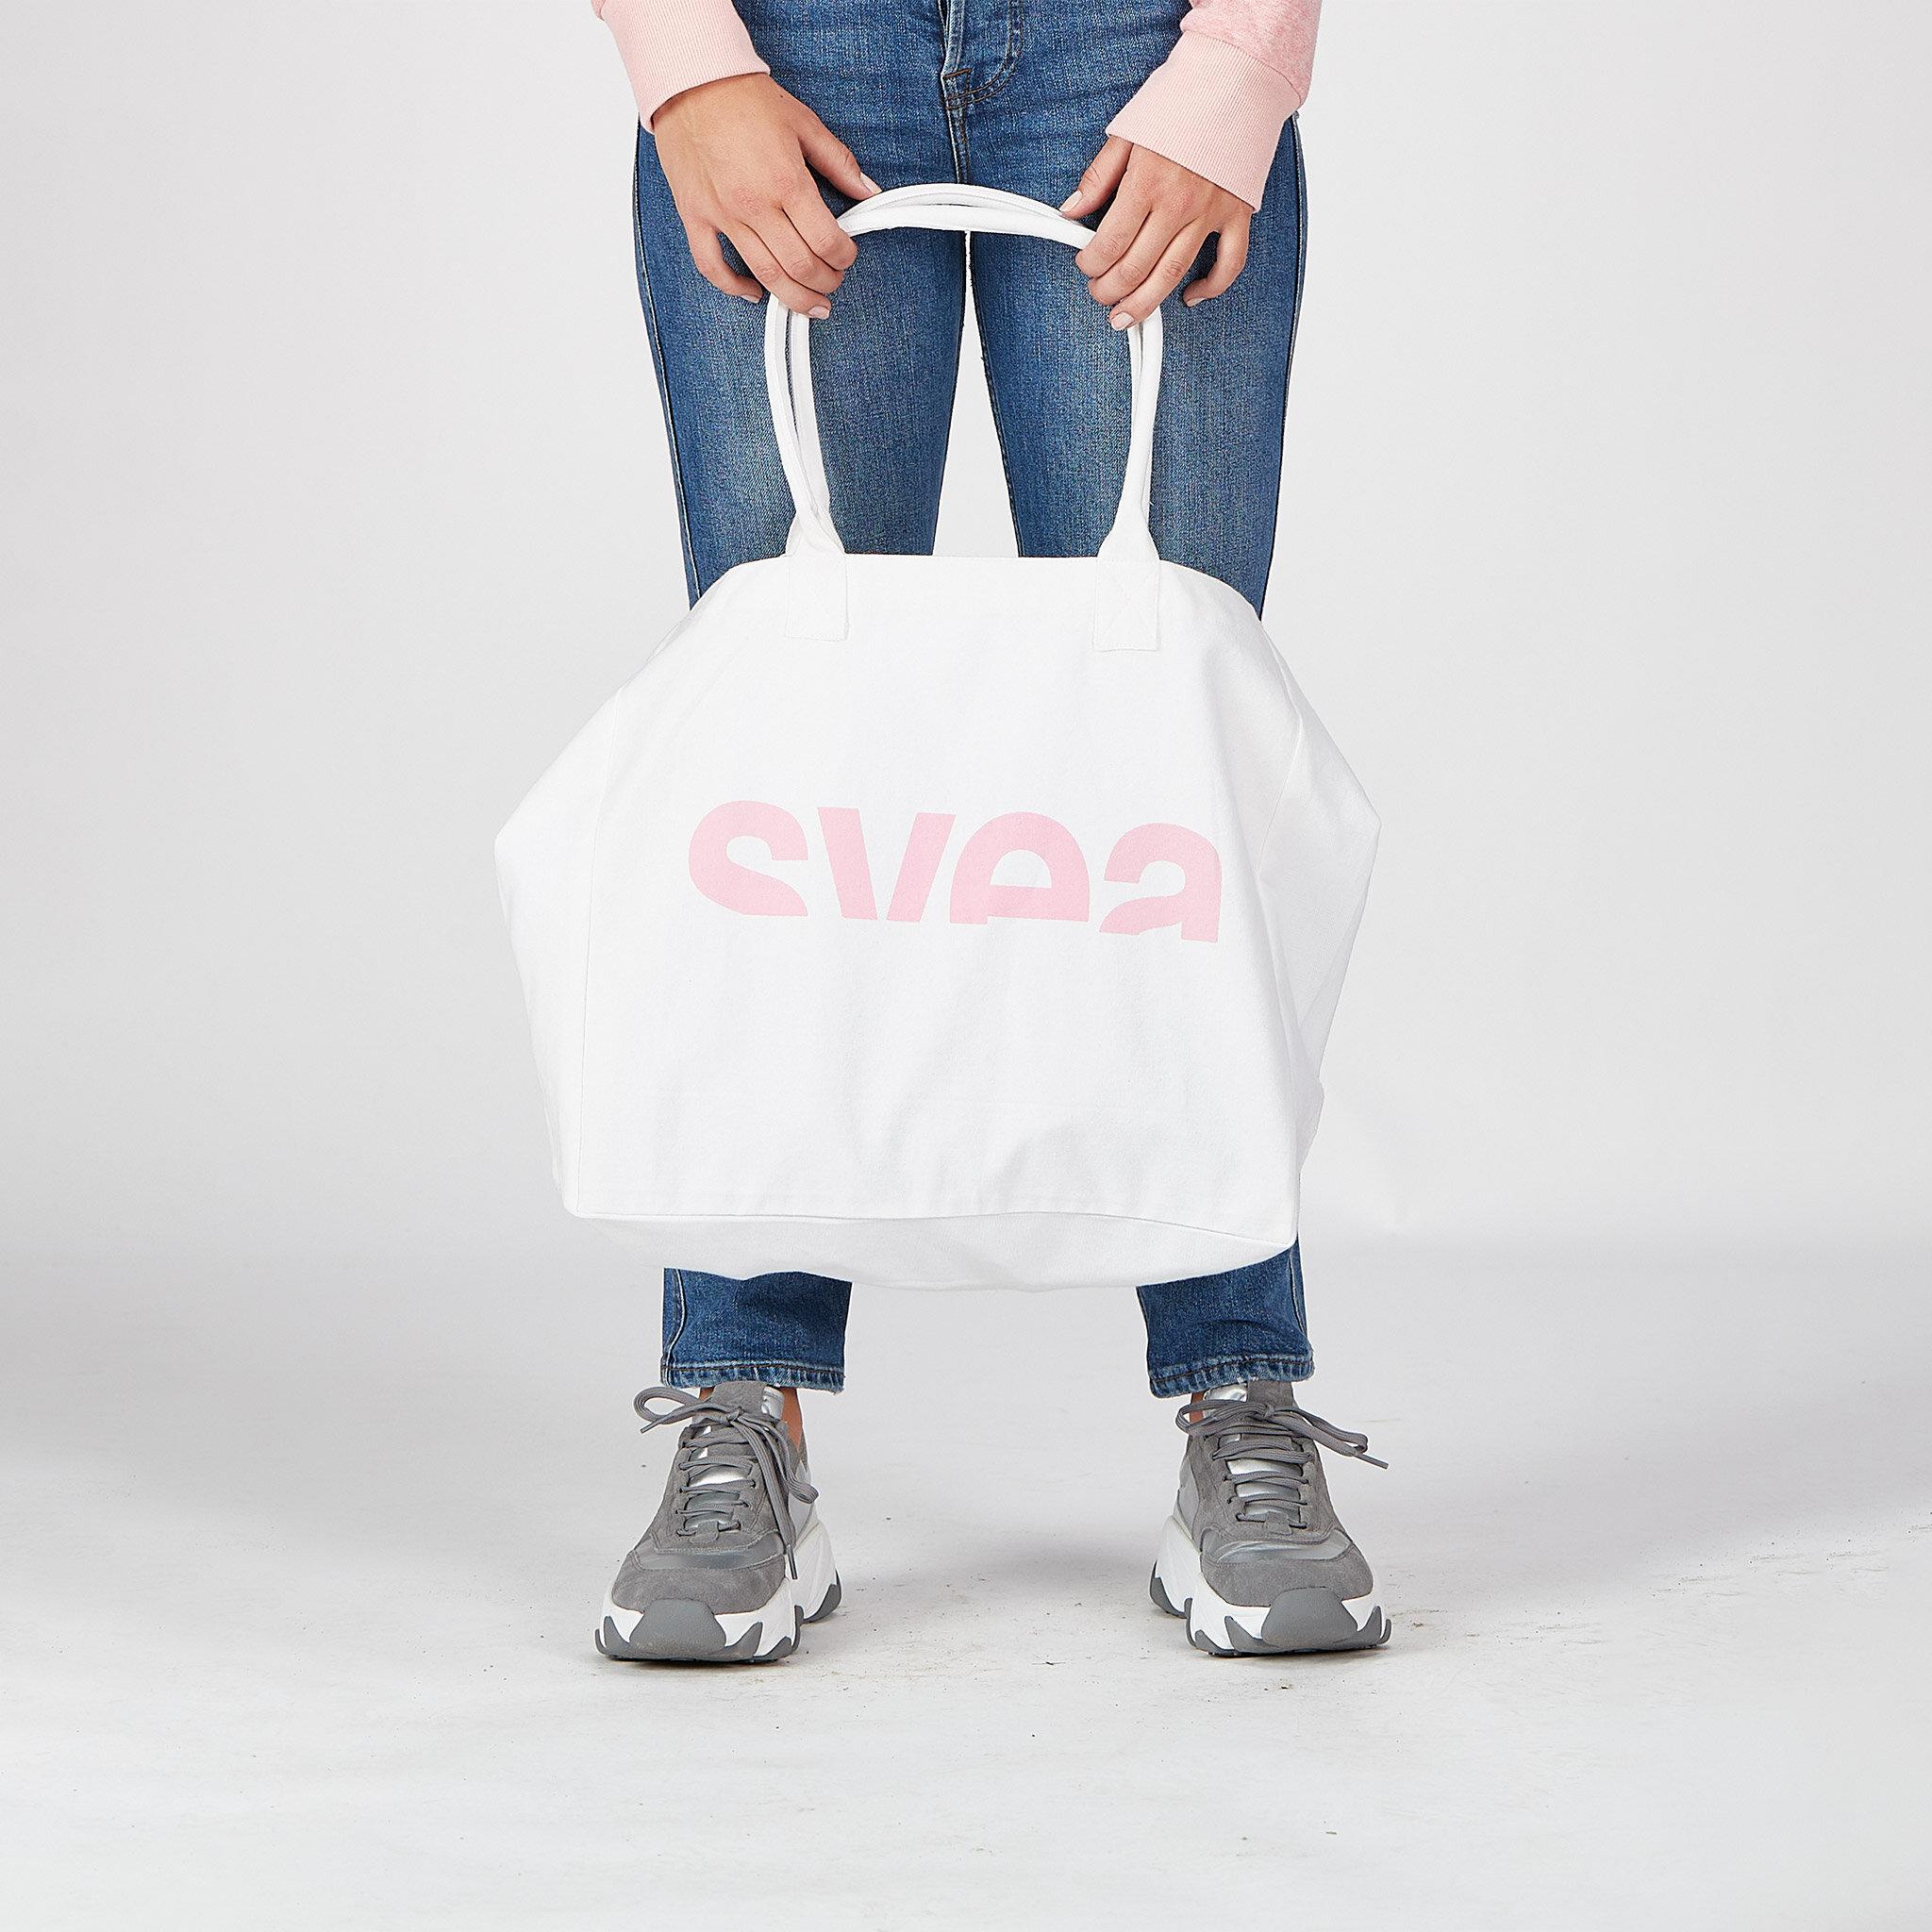 Svea Shopping Bag